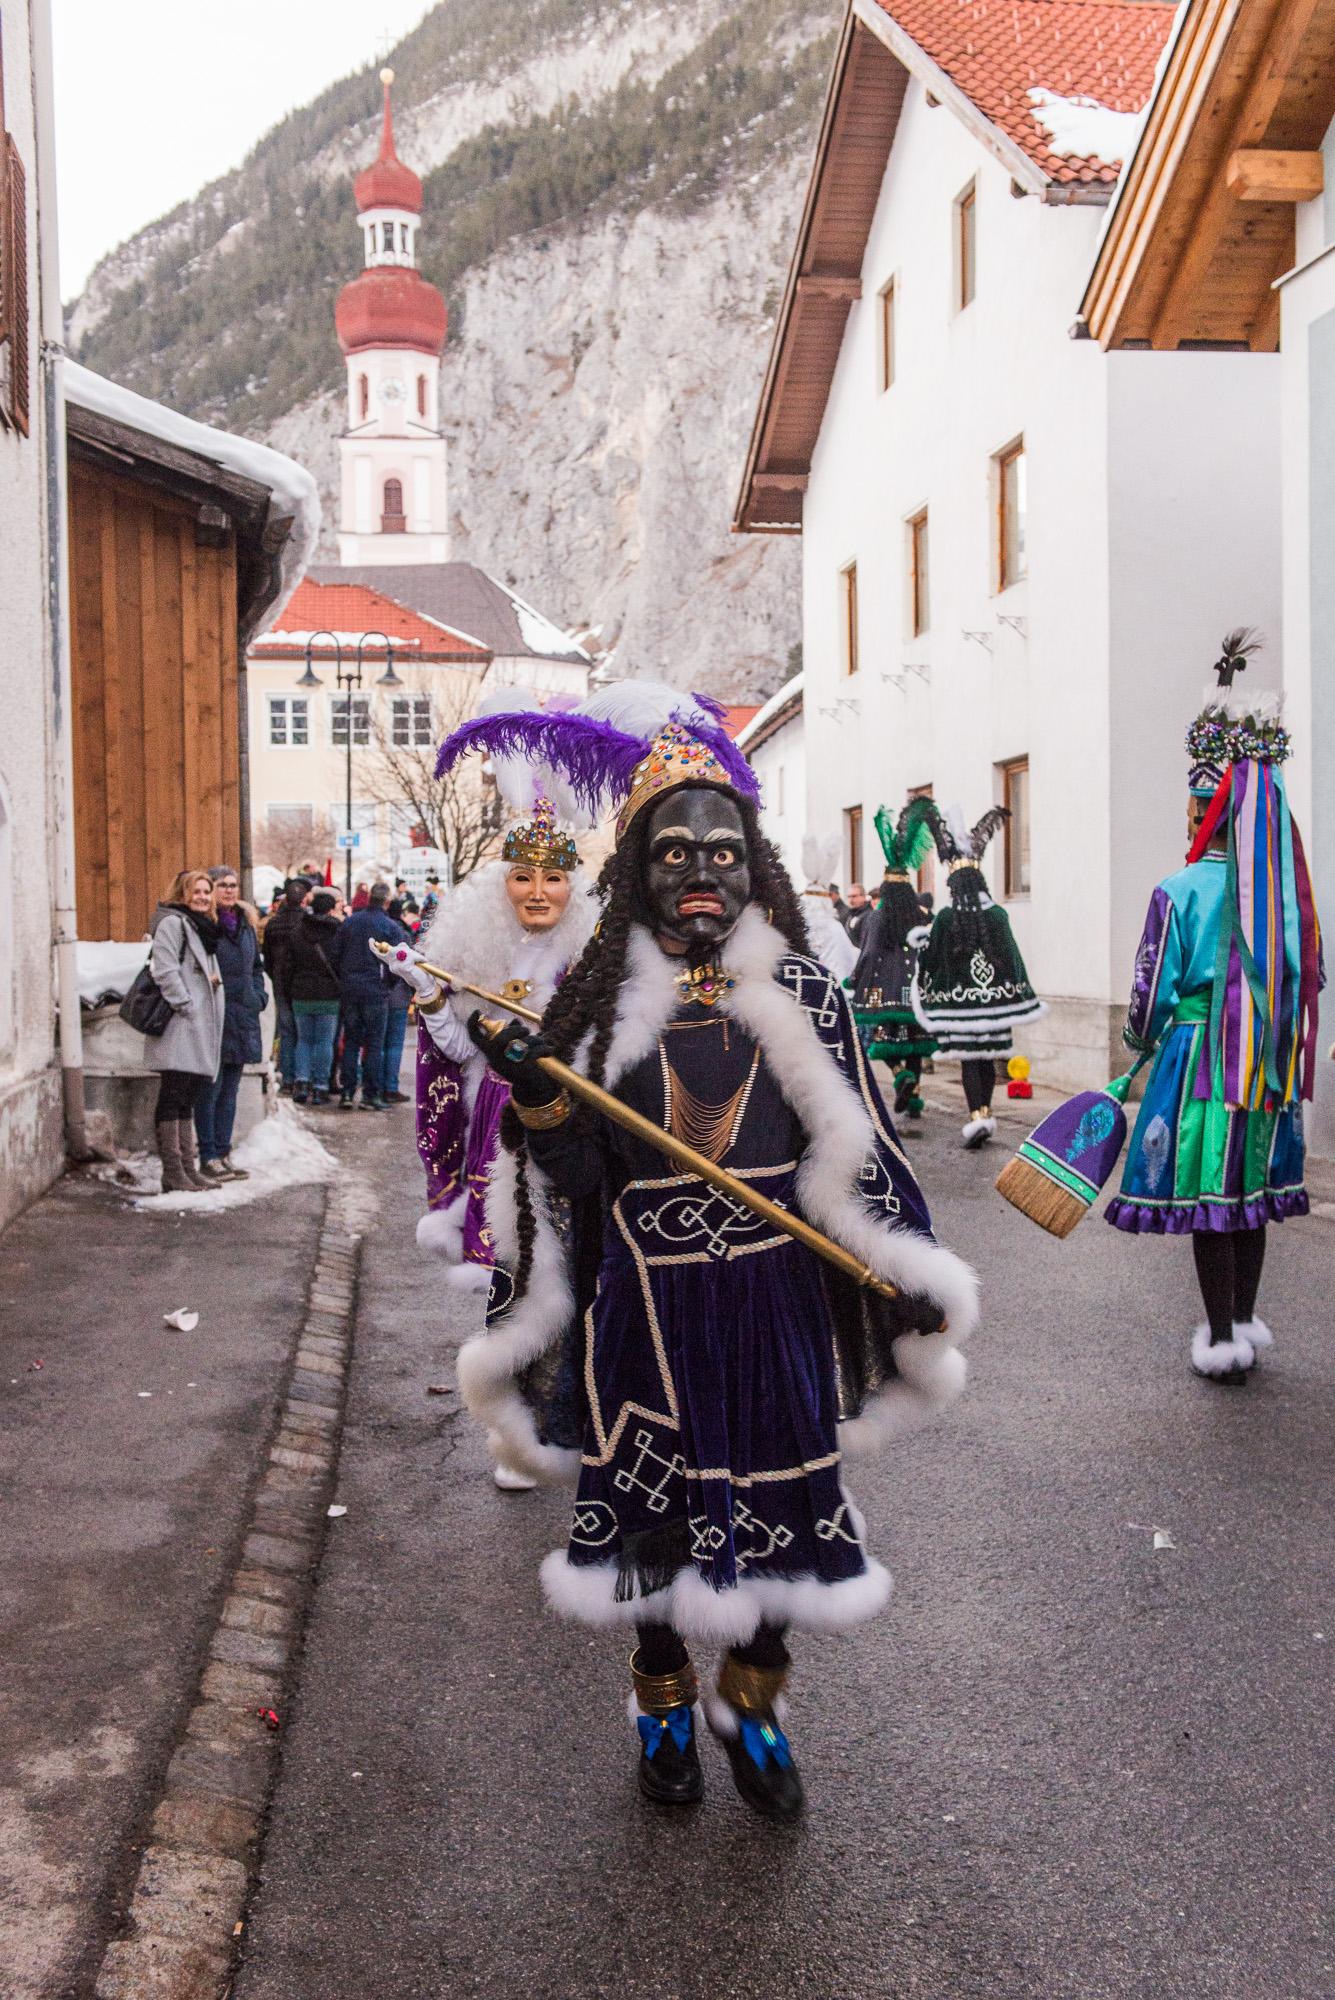 2019_Feb_Austria_Nassareith_Carnaval_2110.jpg